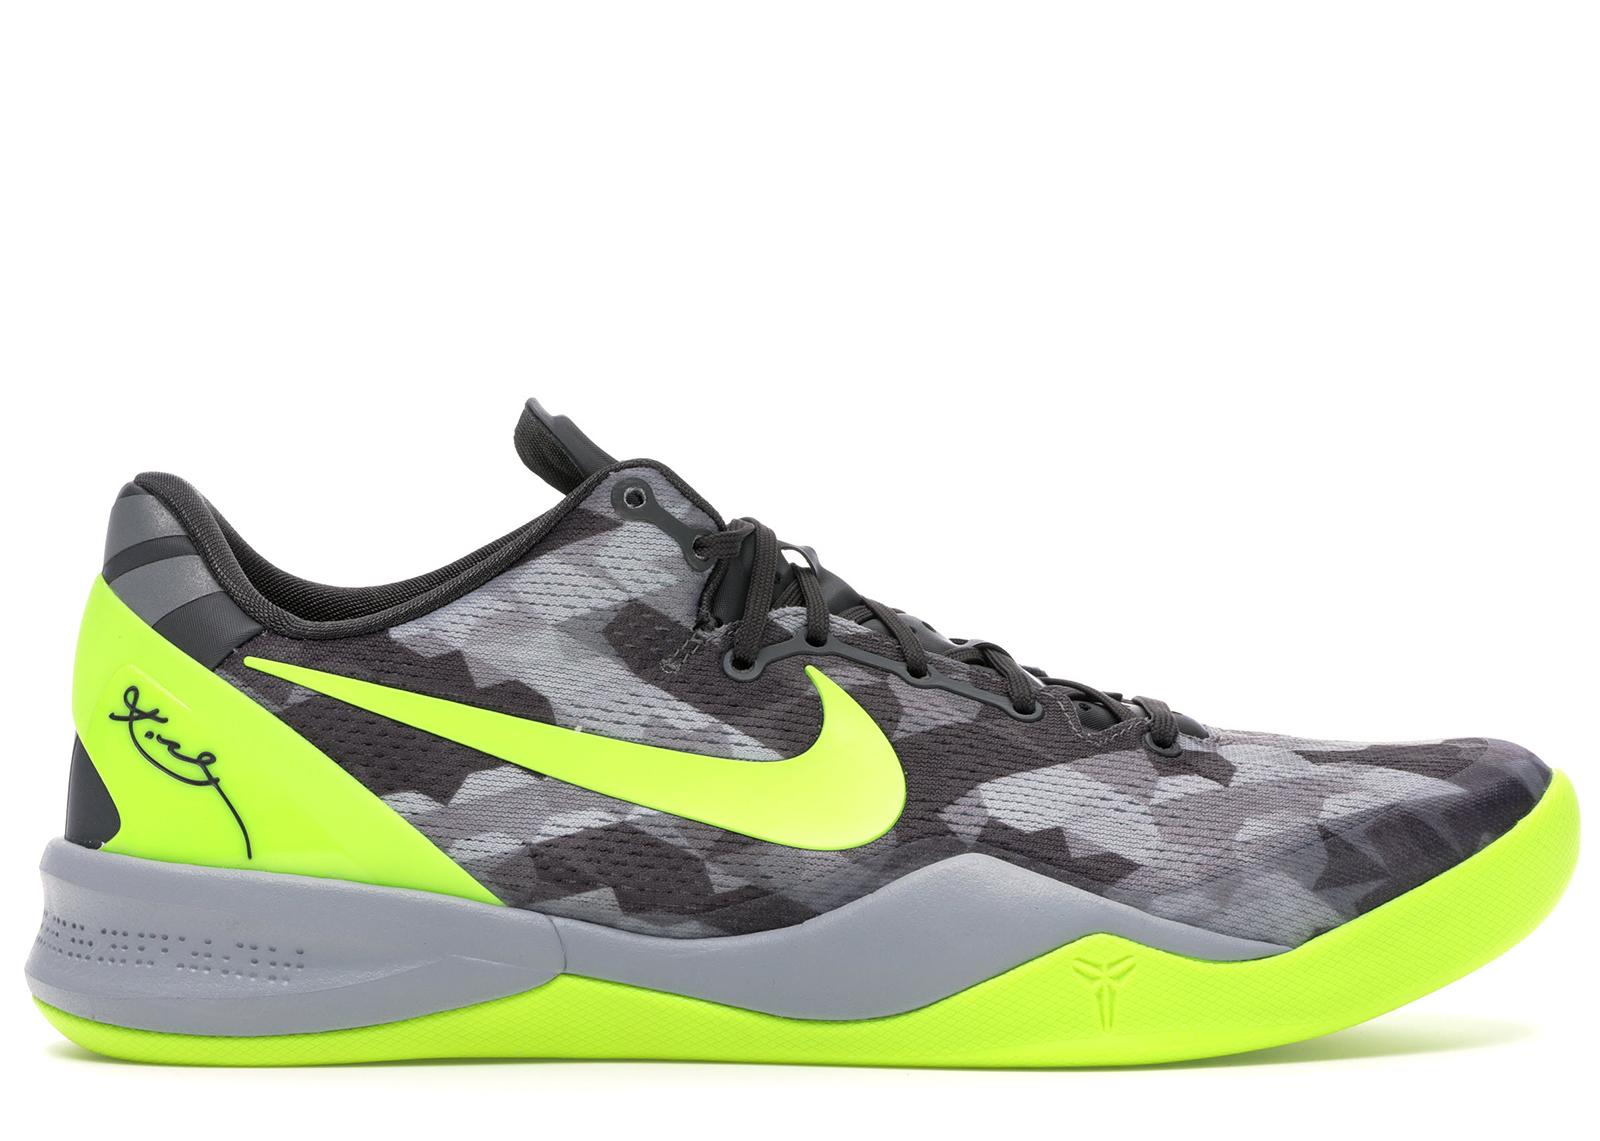 Nike Kobe 8 Volt - 555035-063